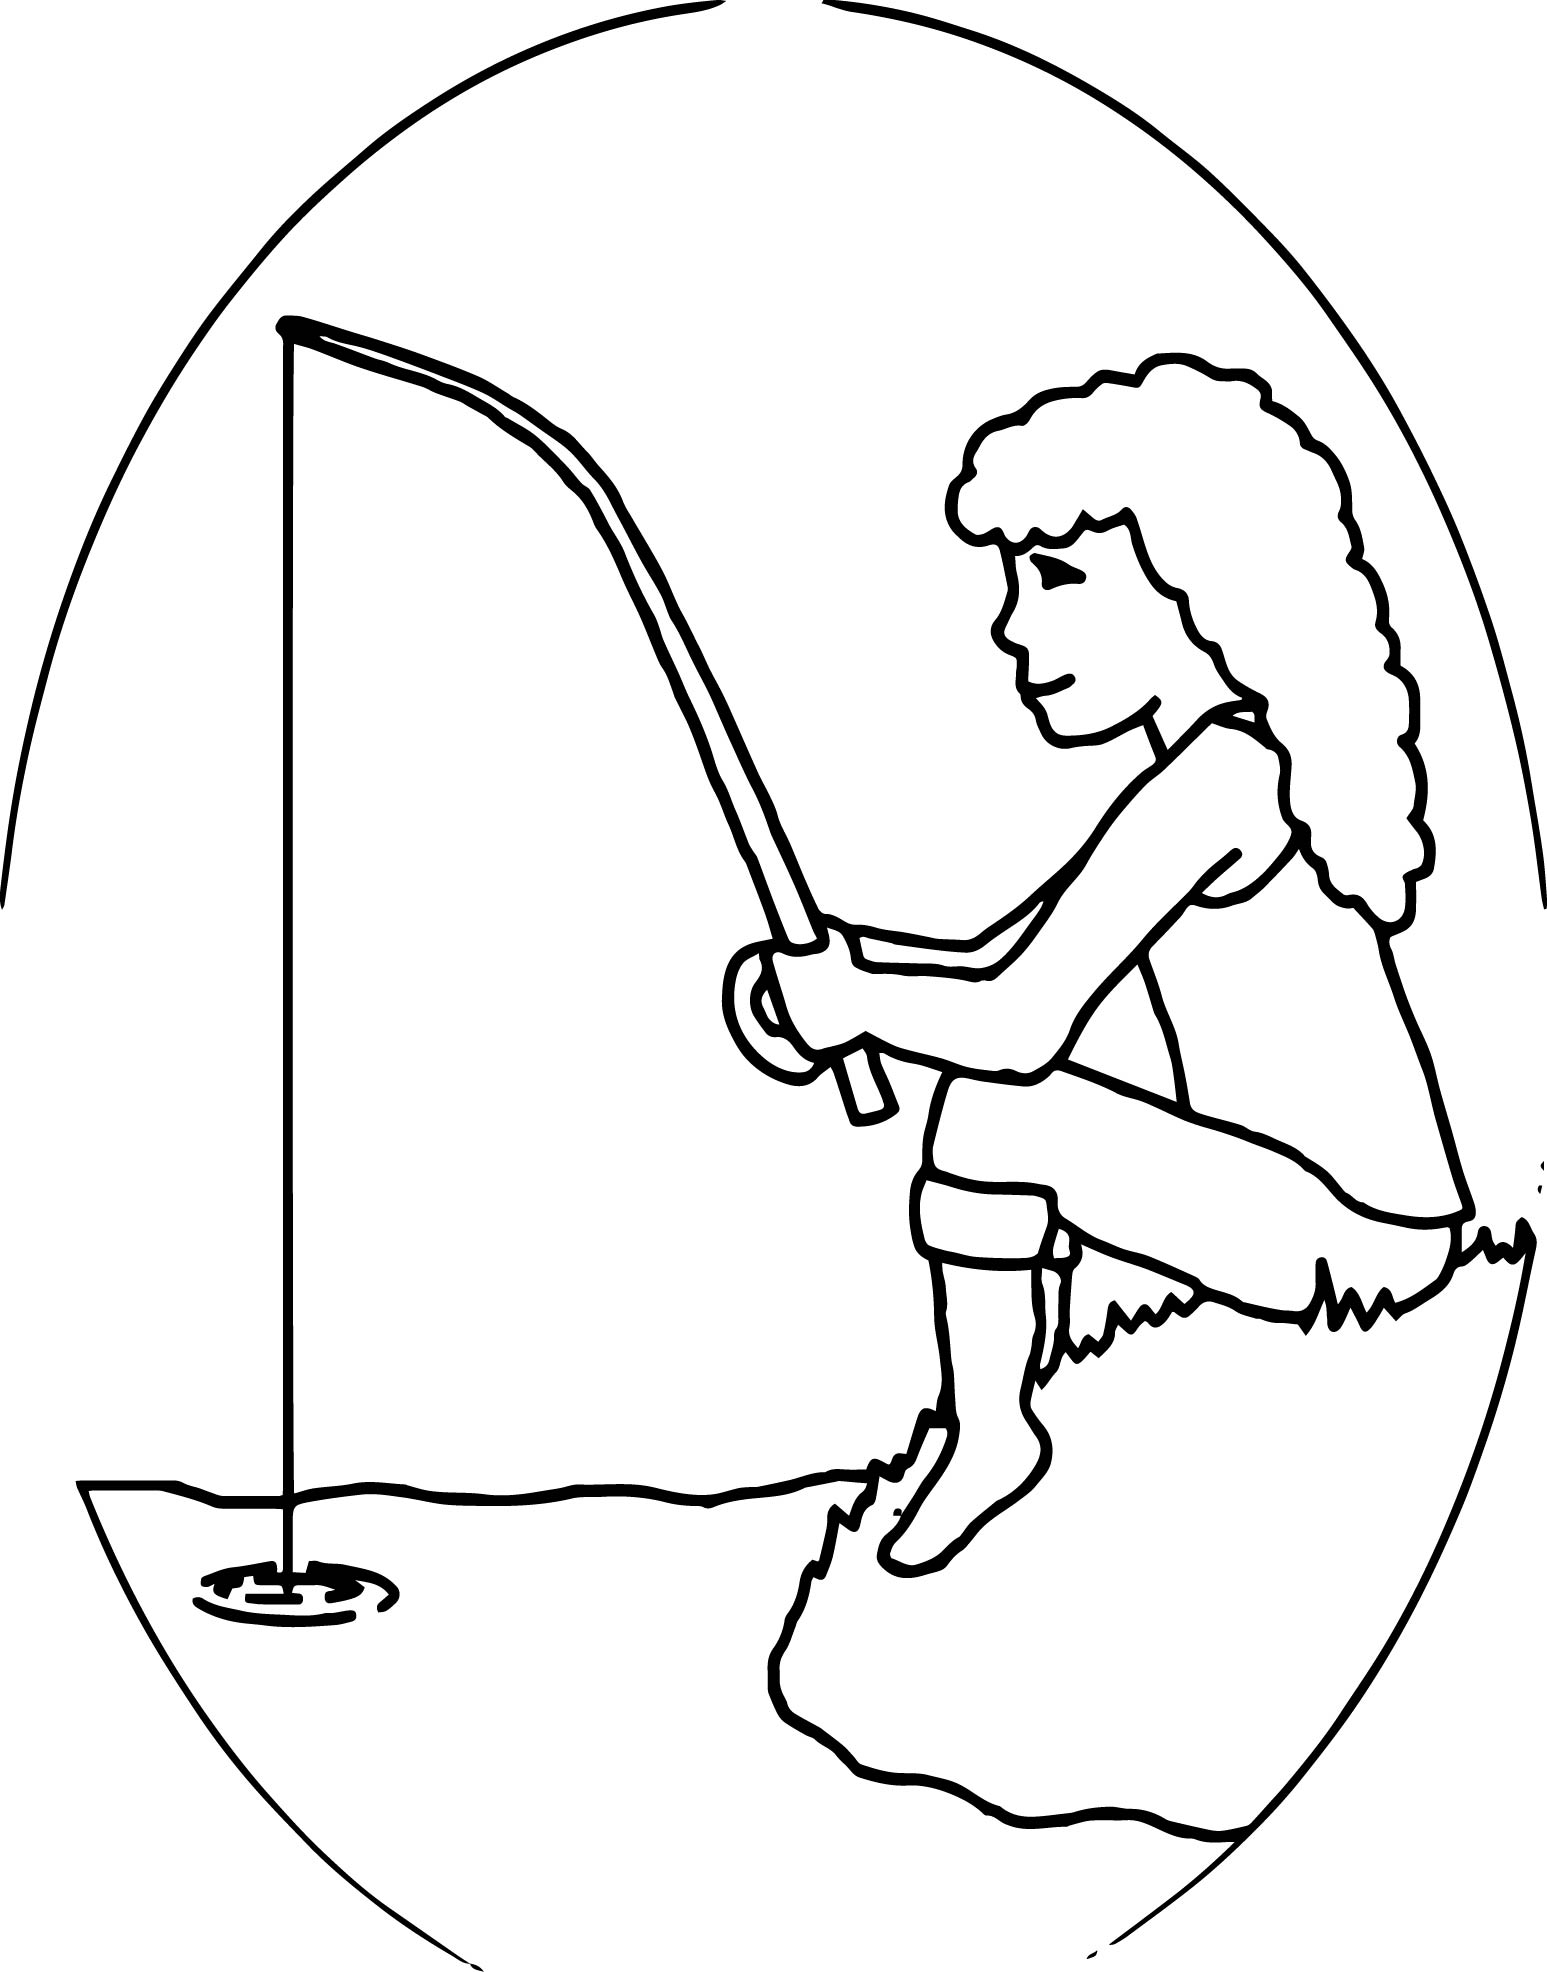 Kids Girl Fishing Coloring Page Wecoloringpage